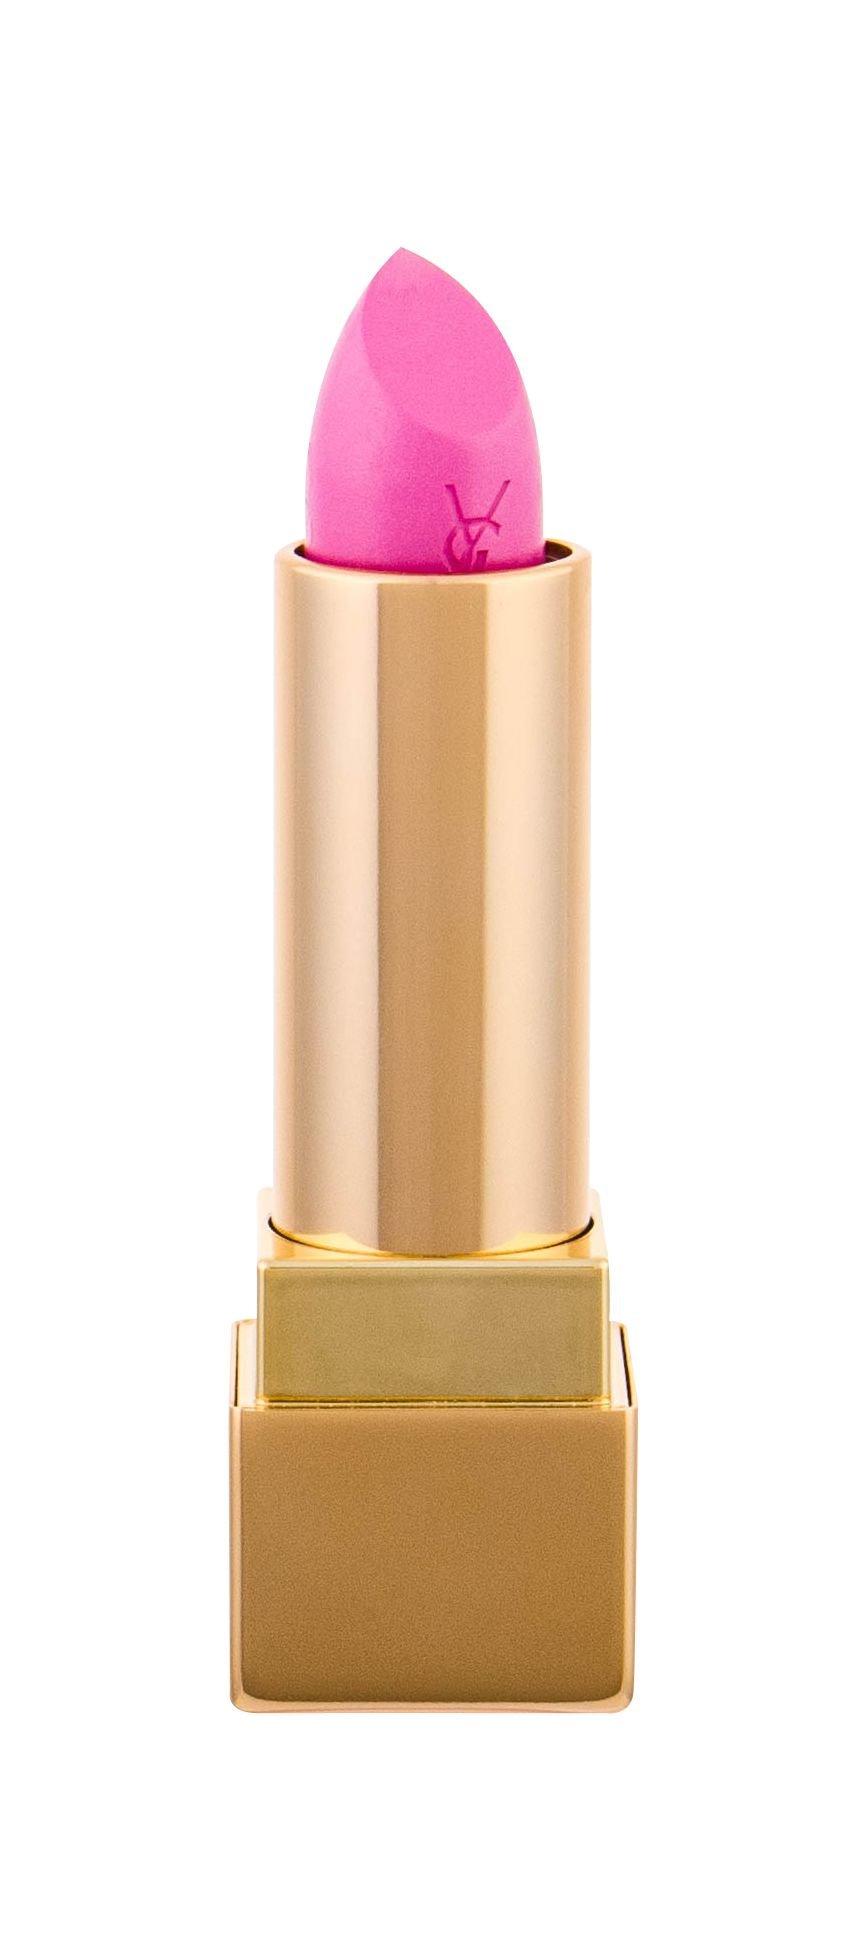 Yves Saint Laurent Rouge Pur Couture Lipstick 3,8ml 22 Rose Celebration